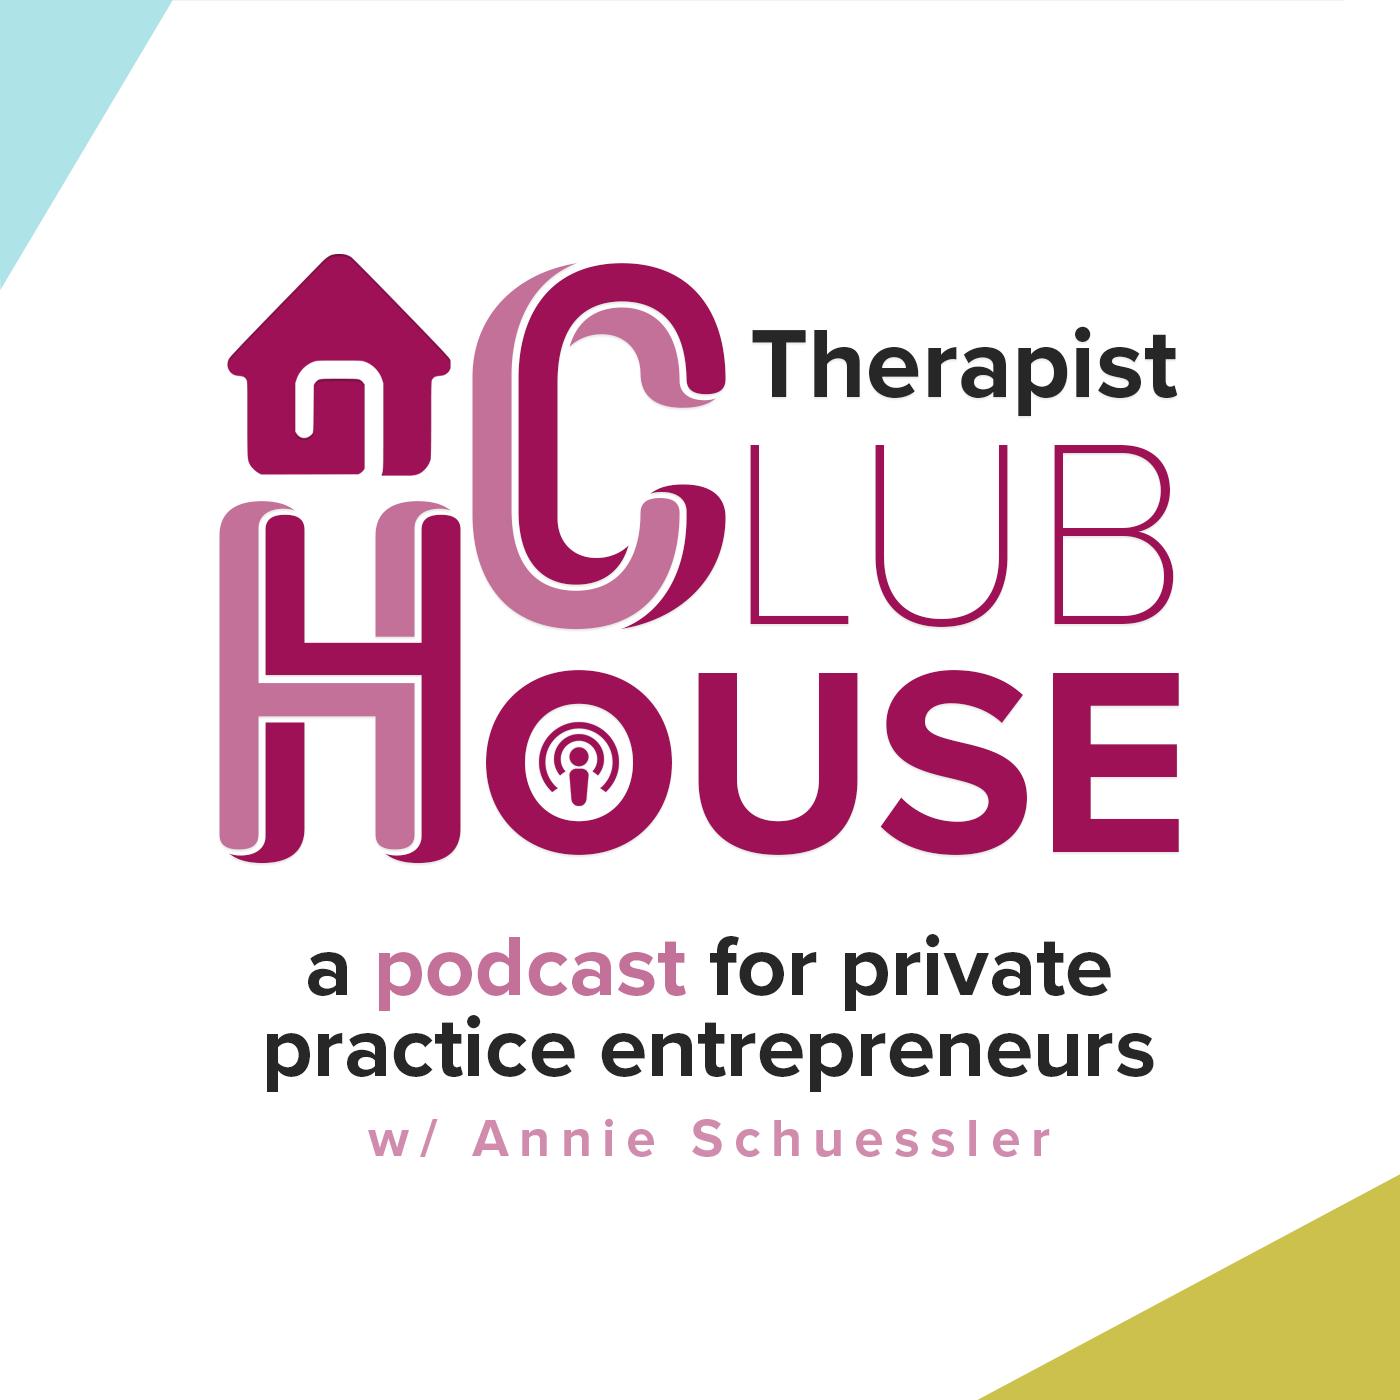 therapistclubhouse